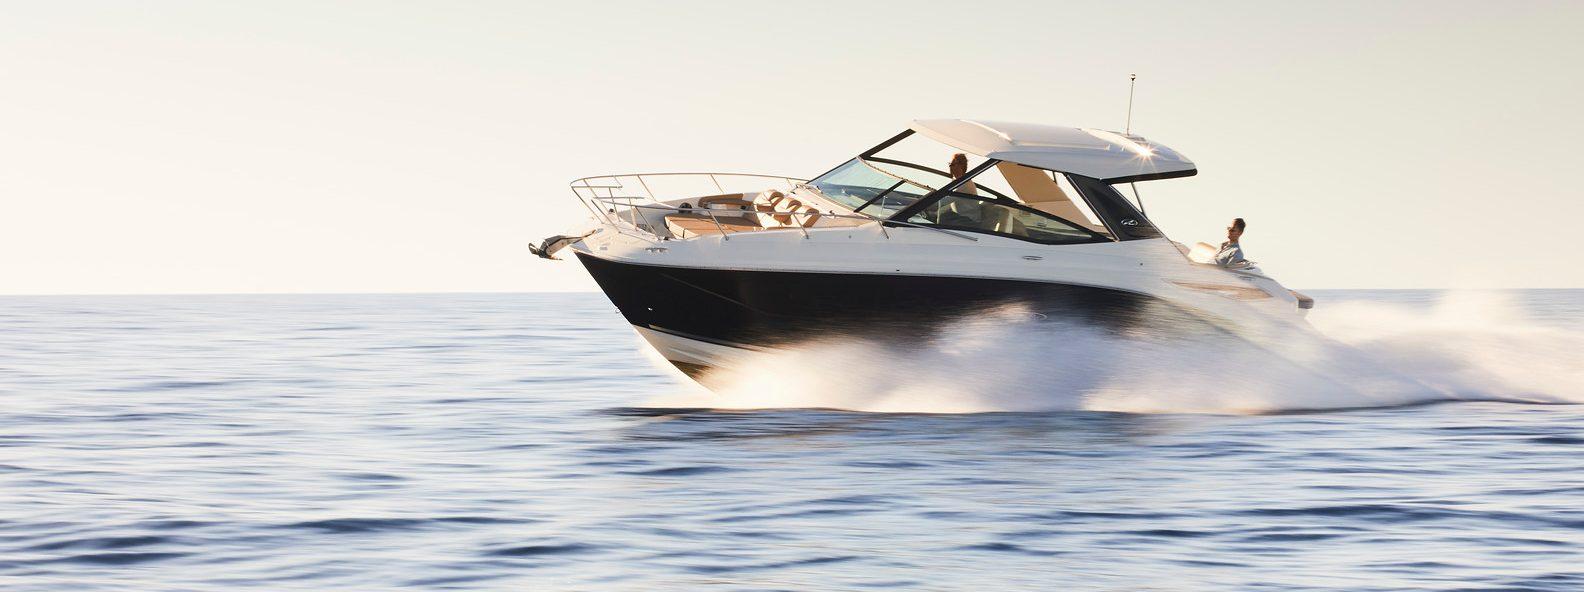 Sea Ray Sundancer 320 in open water